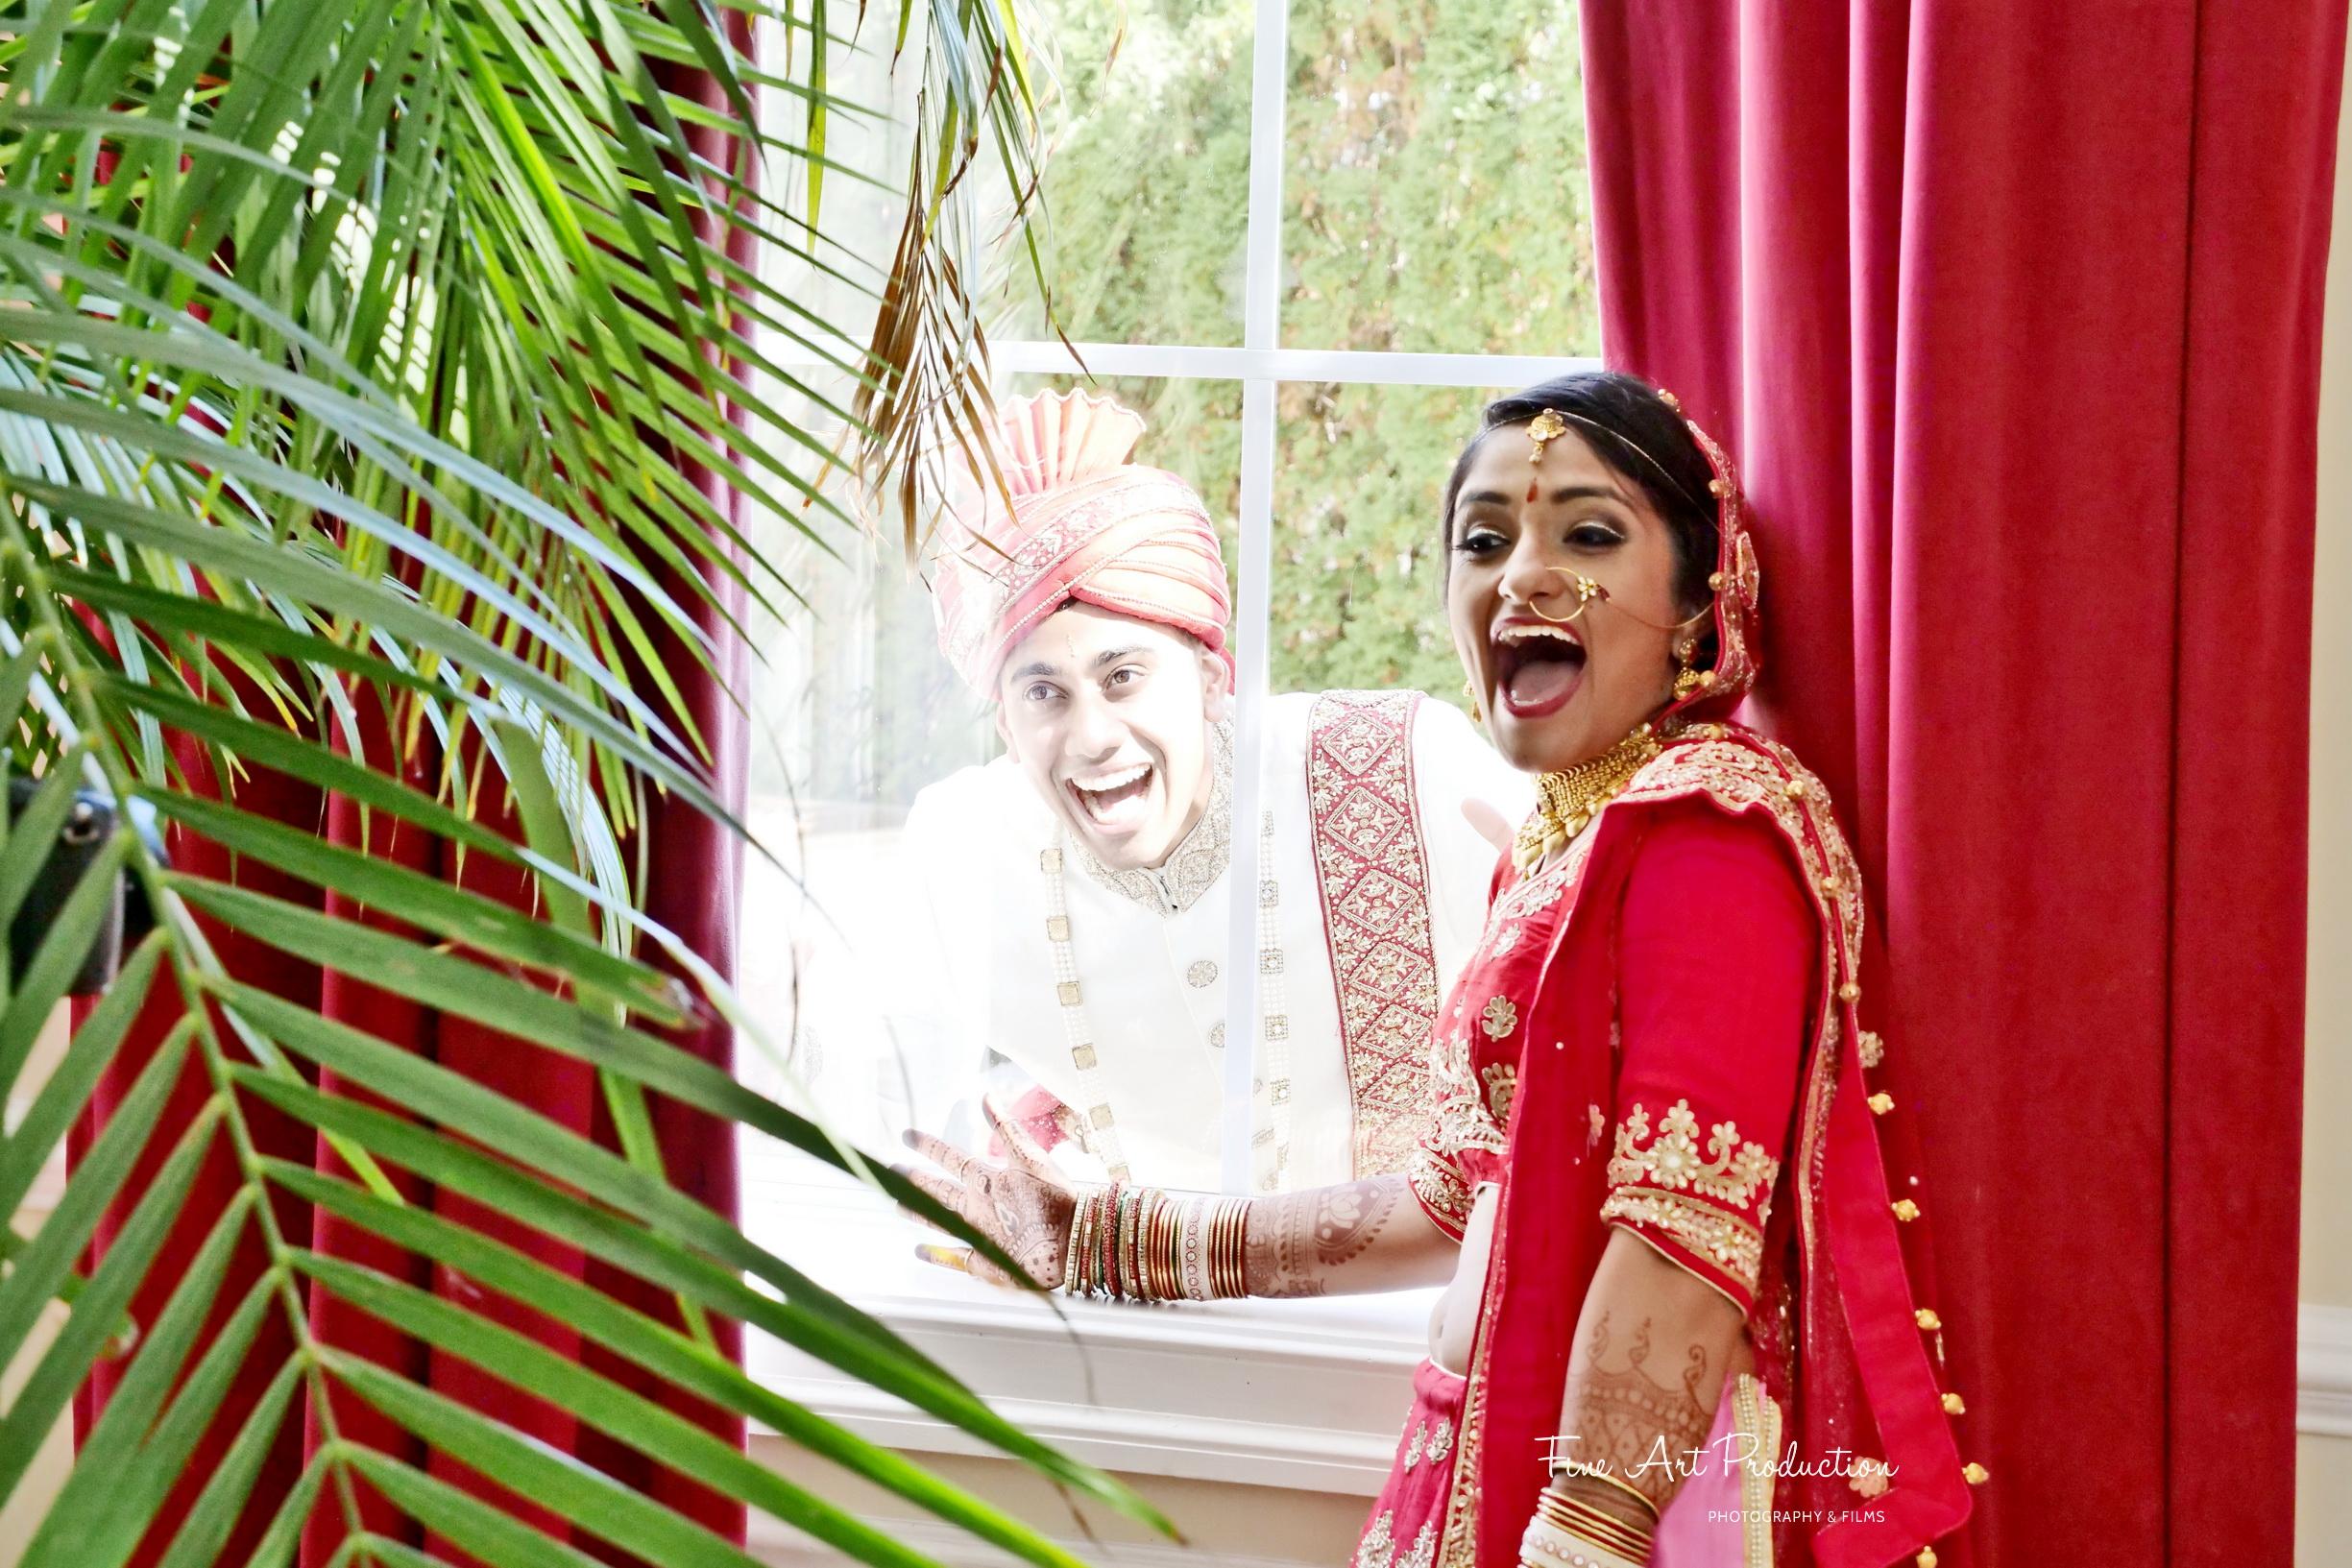 india-wedding-photographer-fine-art-production-chirali-amish-thakkar_0054